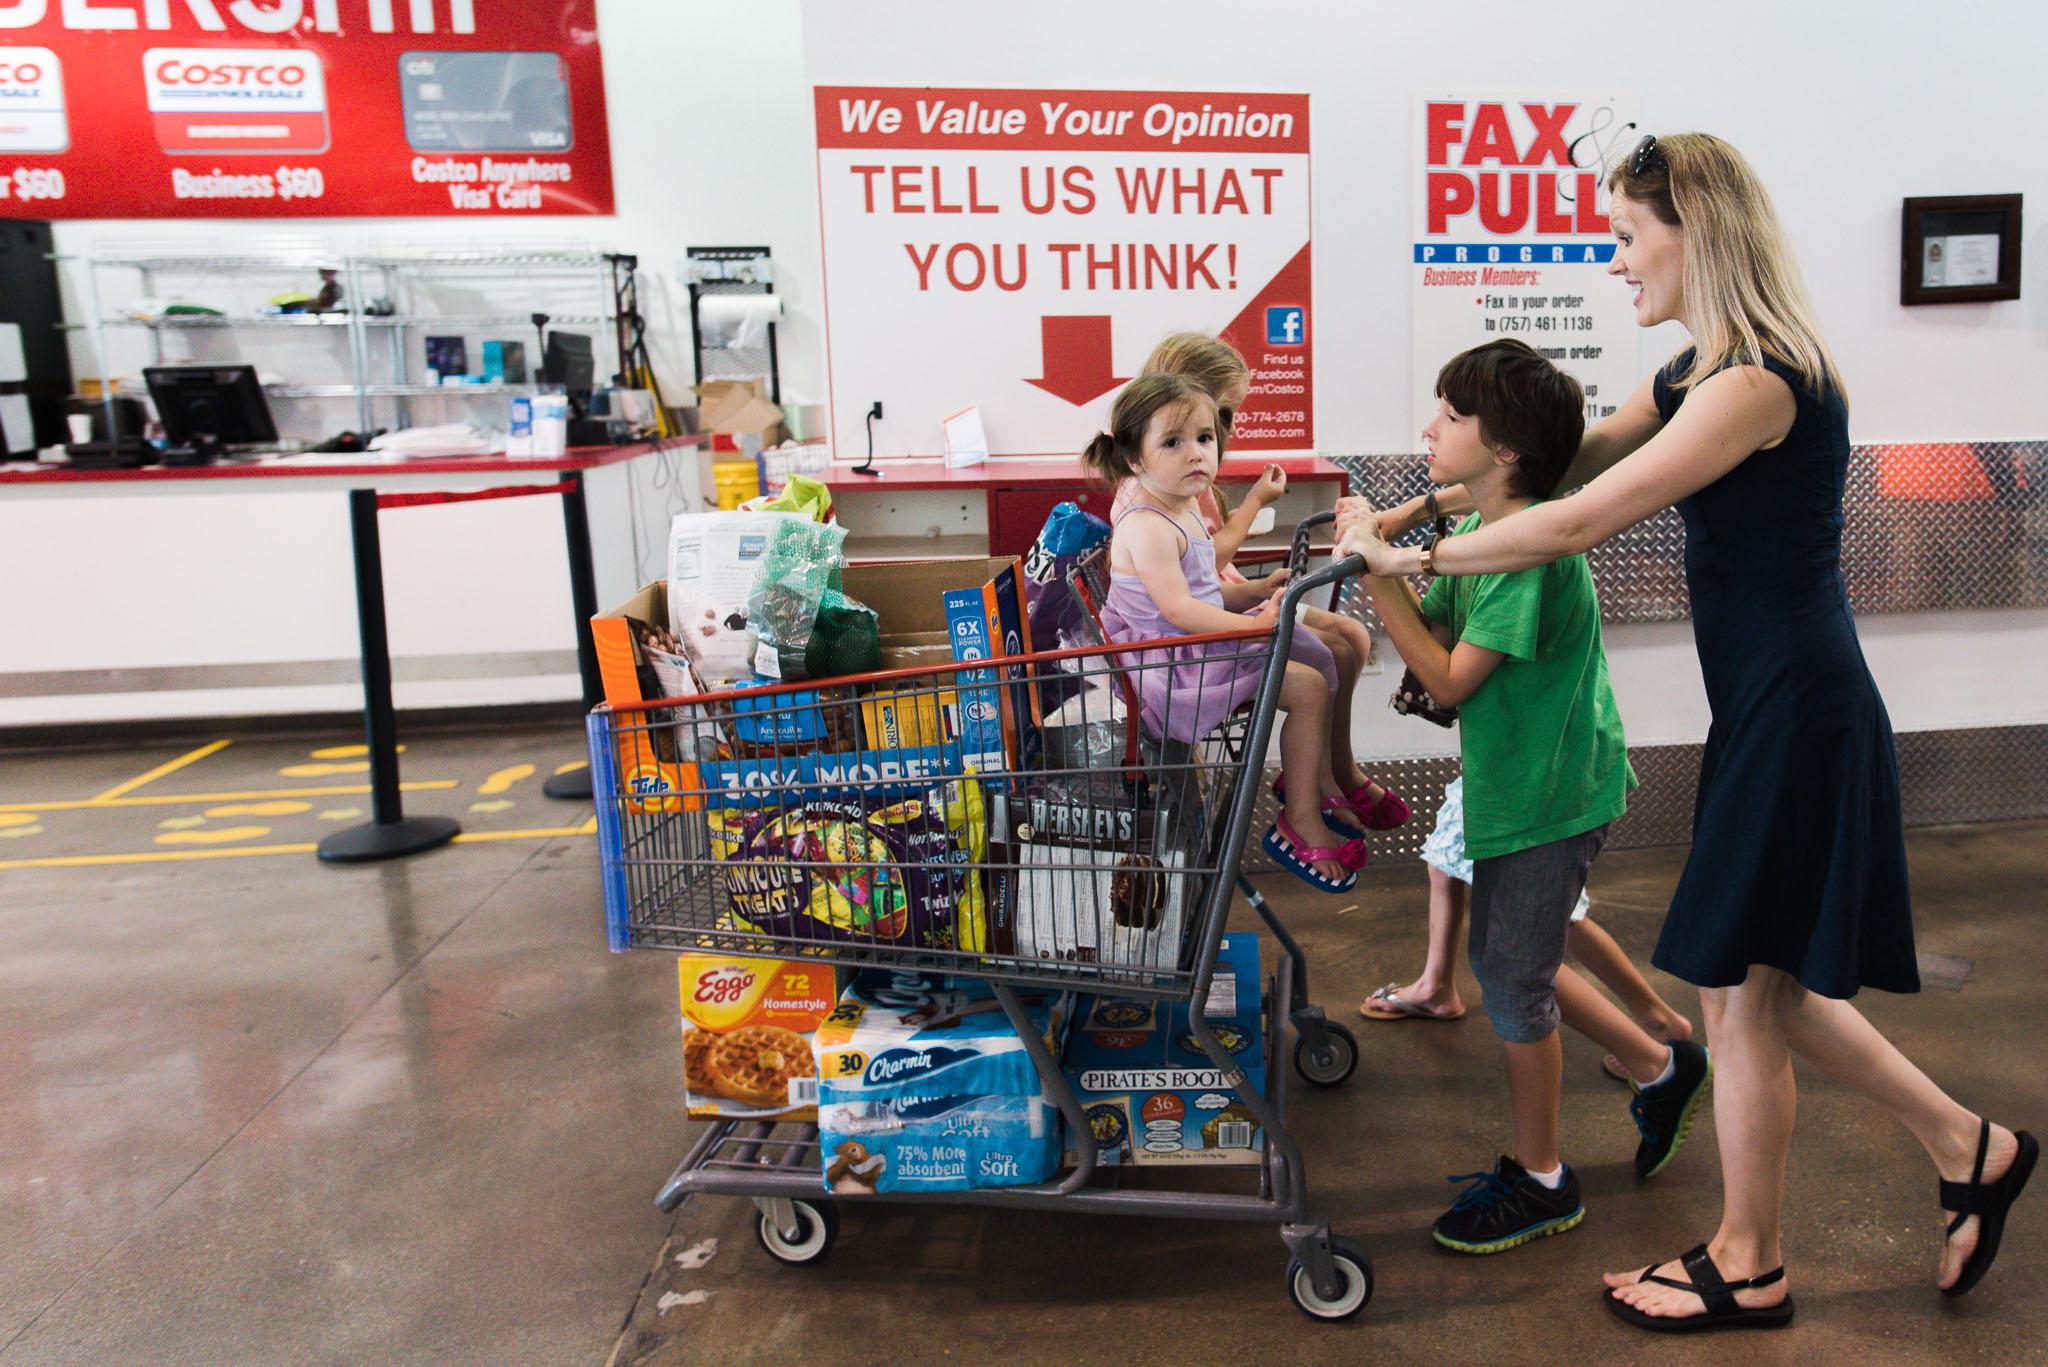 Costco-mom-five-children-blog-13.jpg